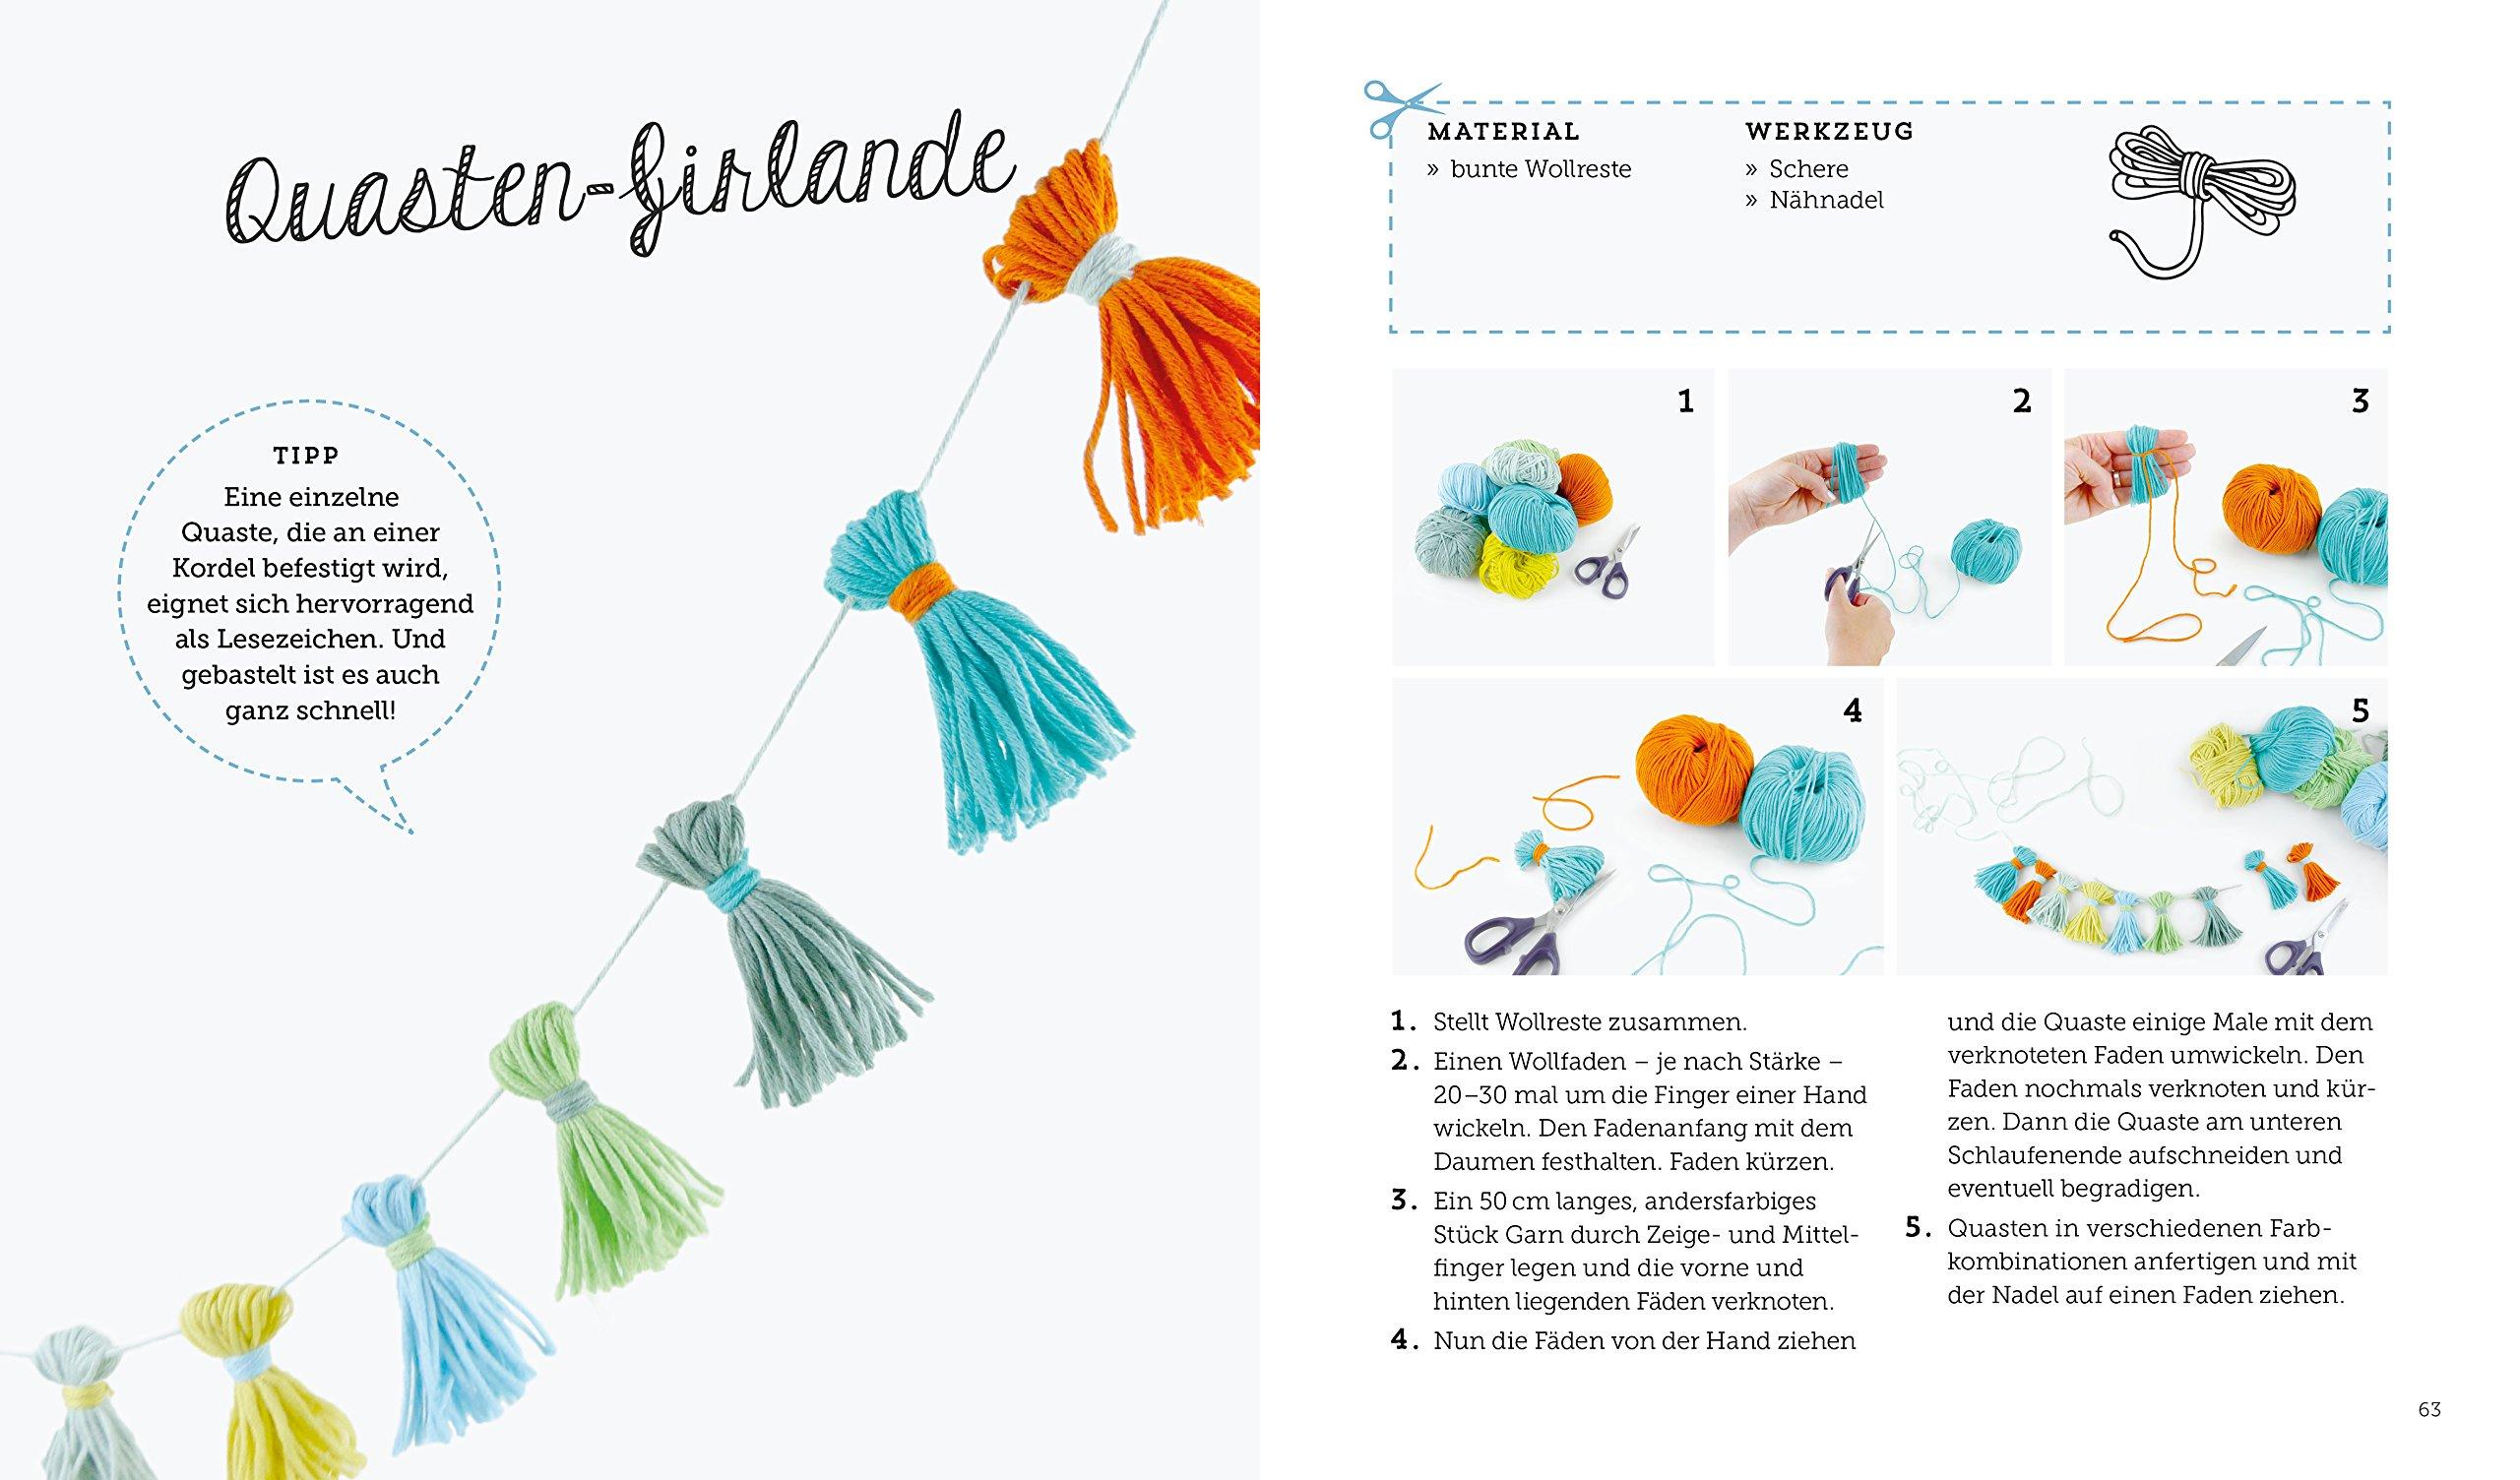 Einfach Basteln Kids: Lustige Projekte In Maximal 5 Schritten: Amazon.de:  Swantje Lindemann, Verena Wöhlk Appel, Daniela Fugger: Bücher